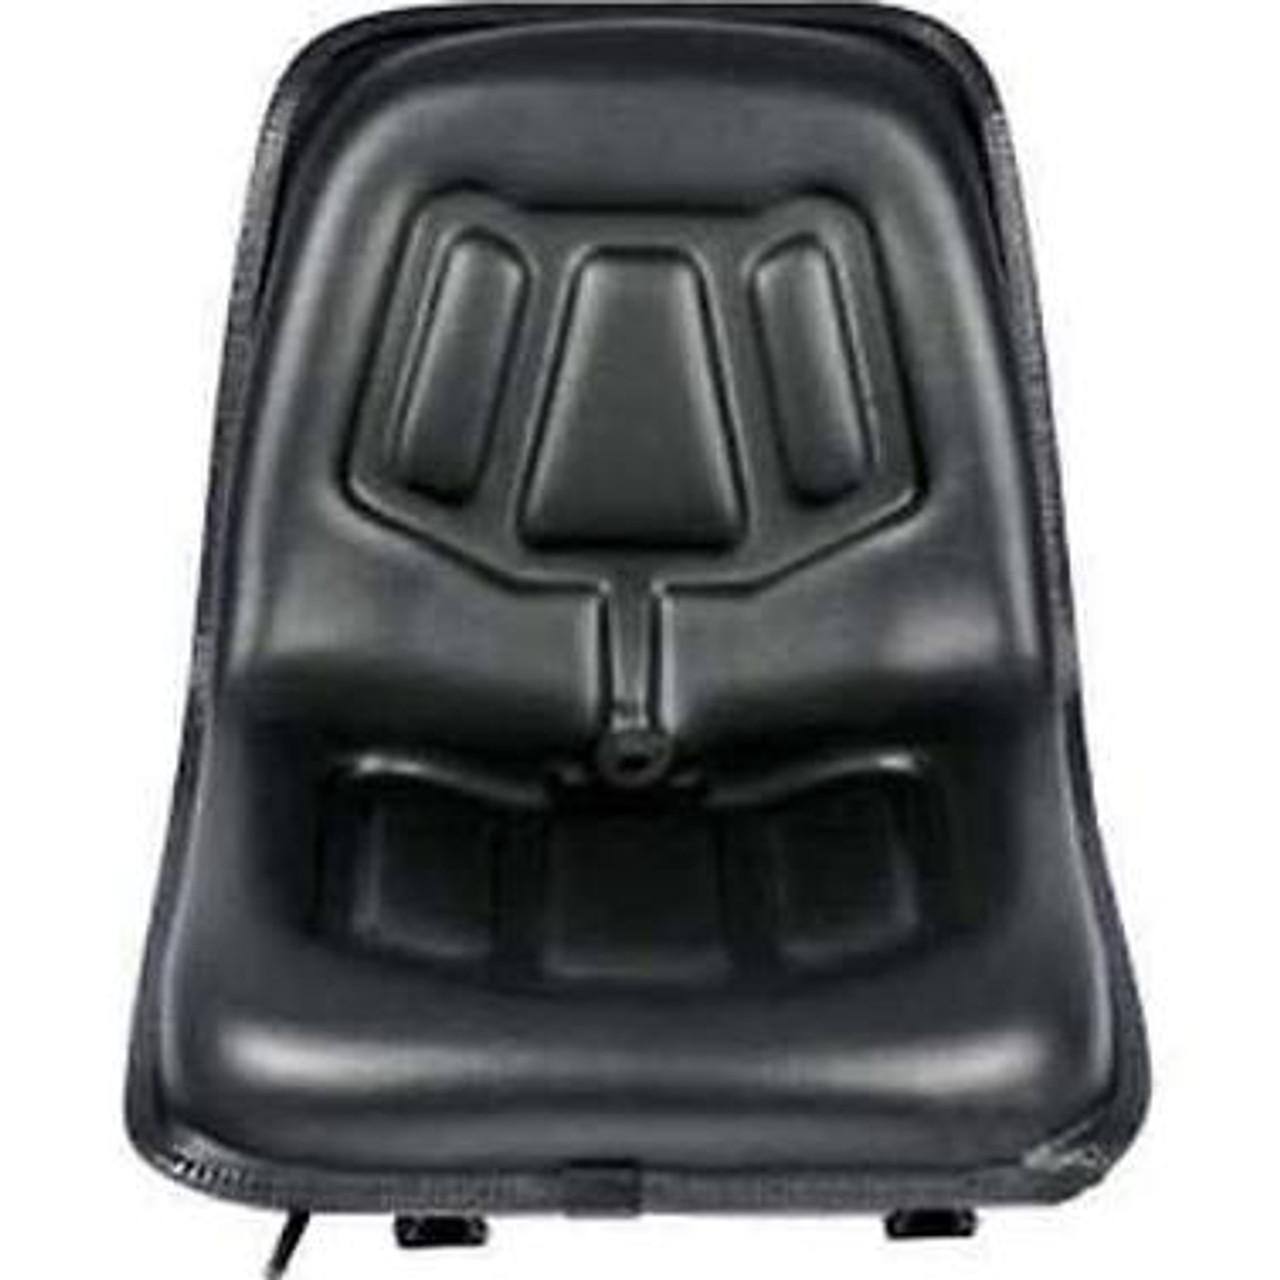 Universal Mower Compact Slider Seat MF Ford John Deere Case/IH LGS100BL